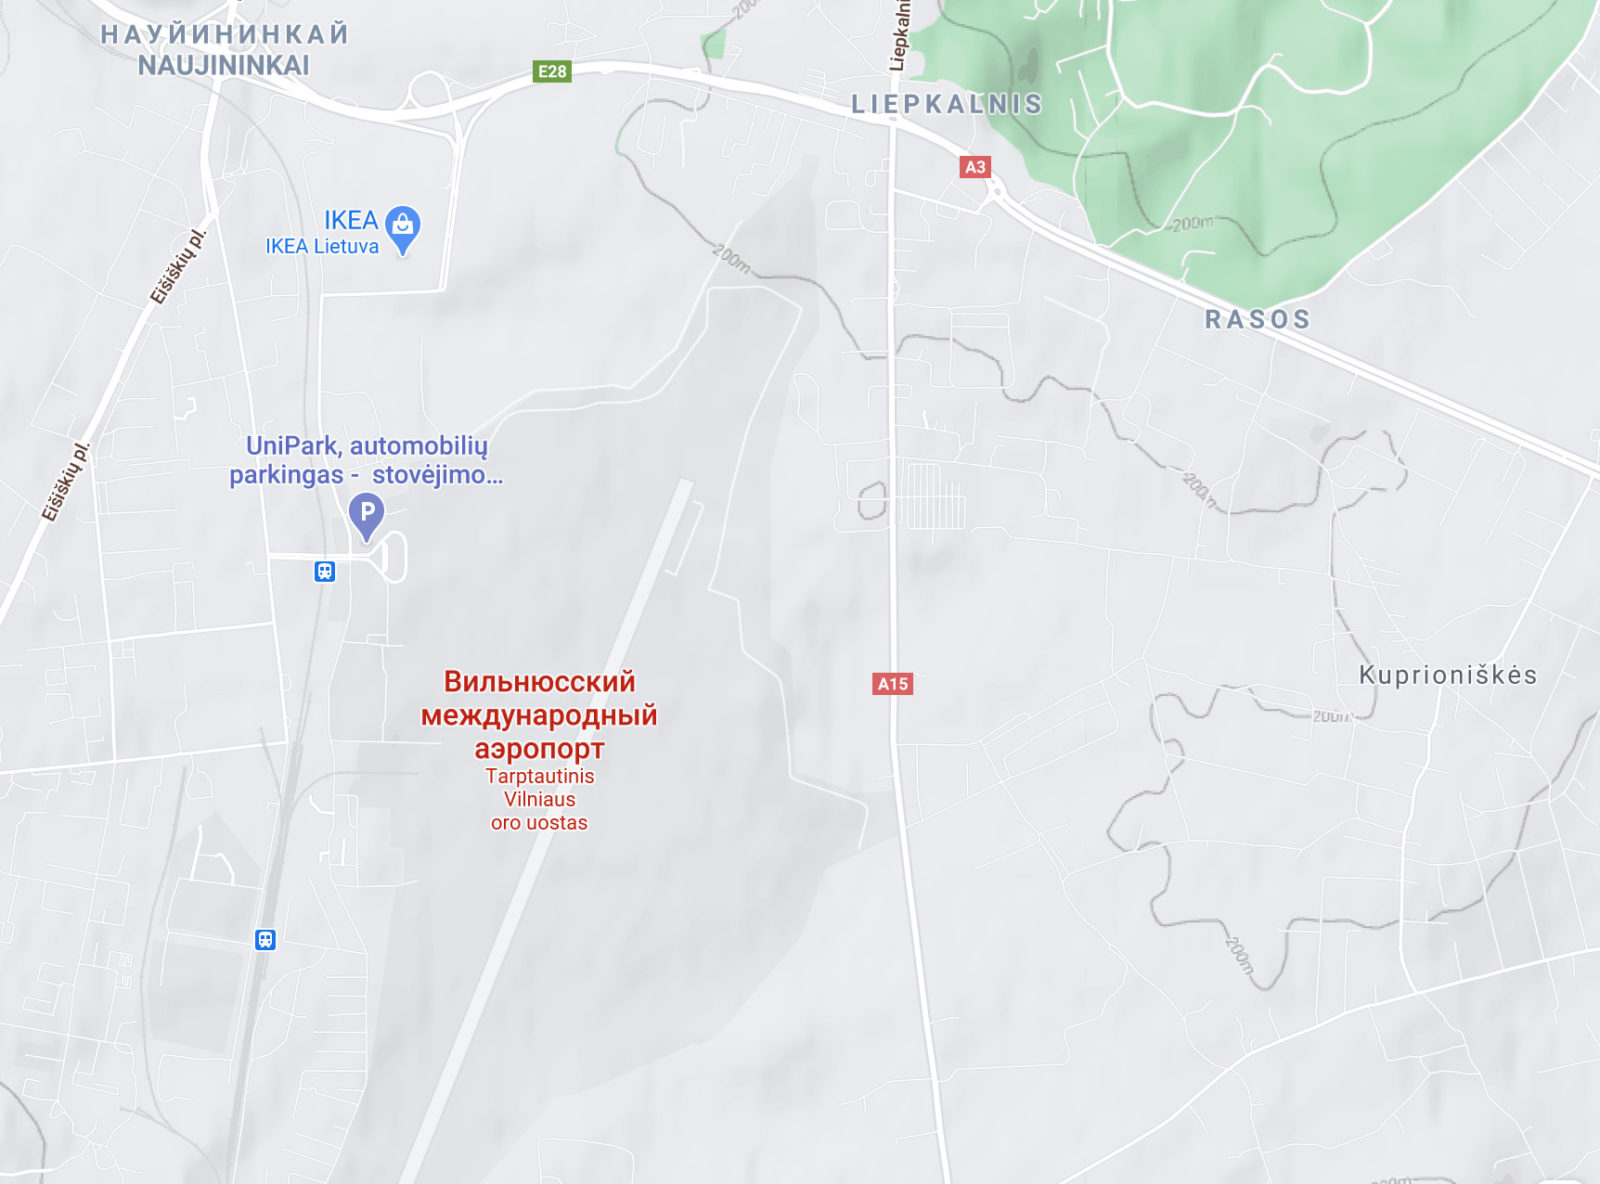 Местоположение аэропорта на карте